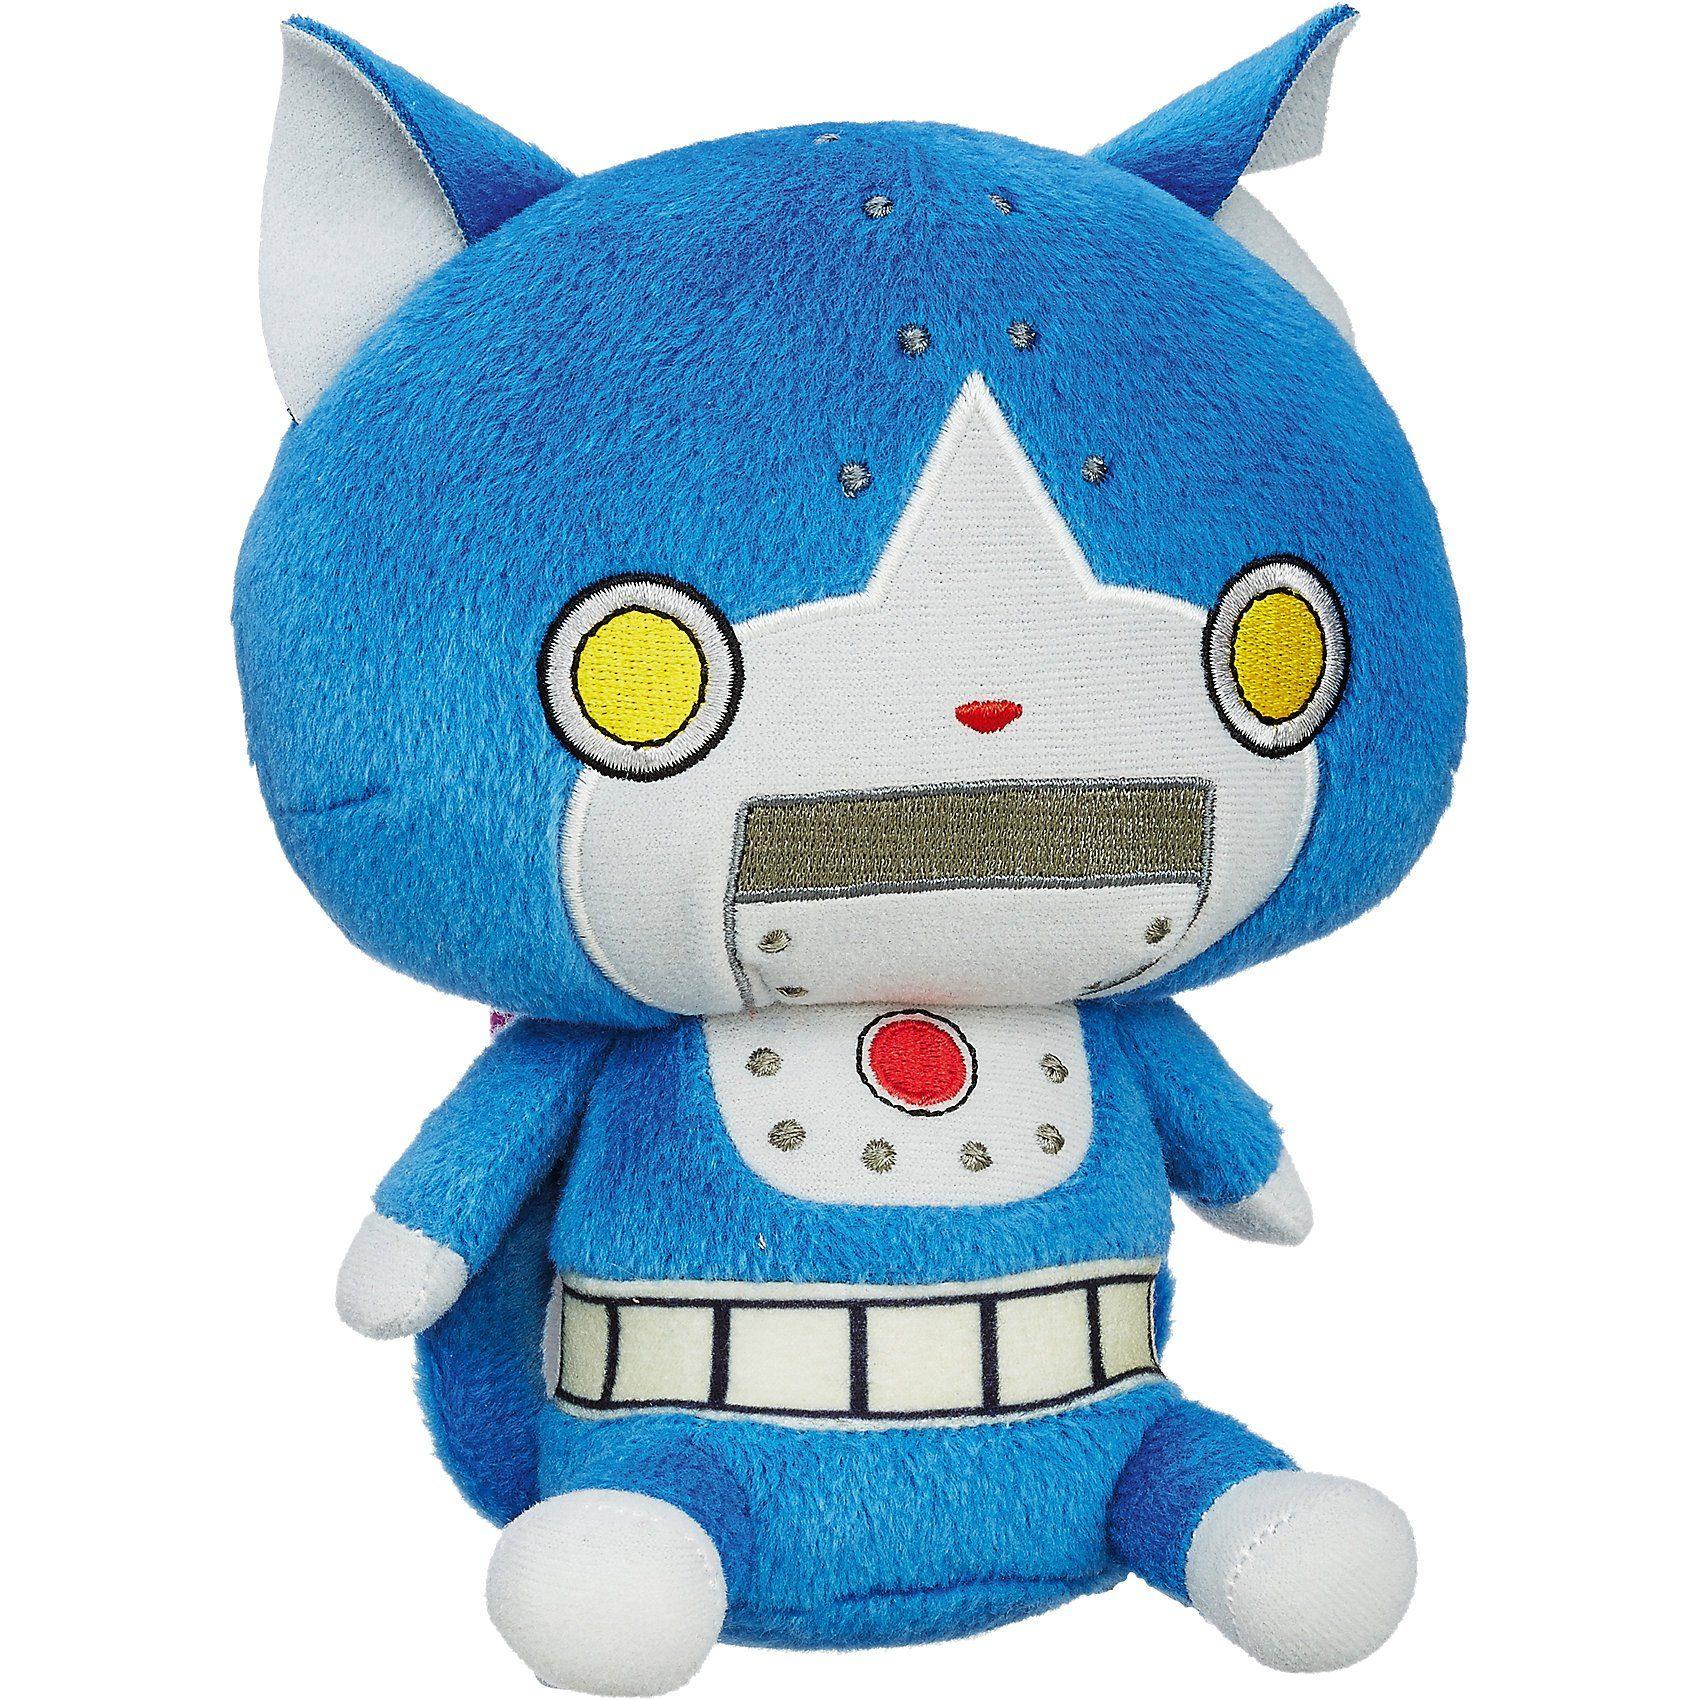 Hasbro Yo-Kai Watch Plüschfigur Robonyan